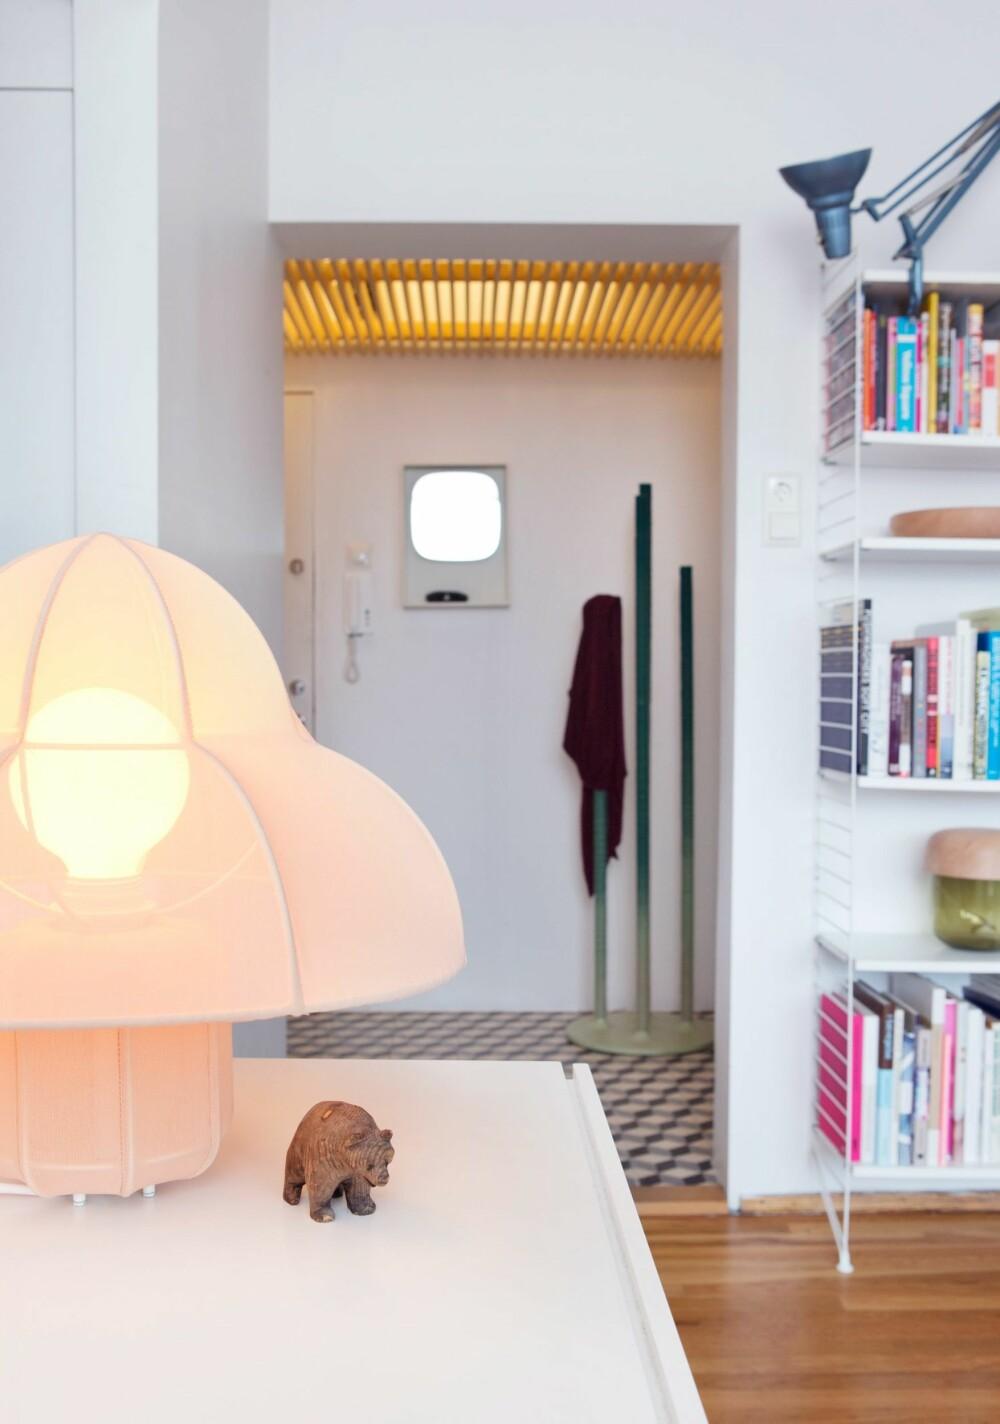 DESIGNER LAMPER: Lampen Ray er eget design. Det samme er den grønne lampen Moa som skimtes helt til høyre, i bokhyllen.